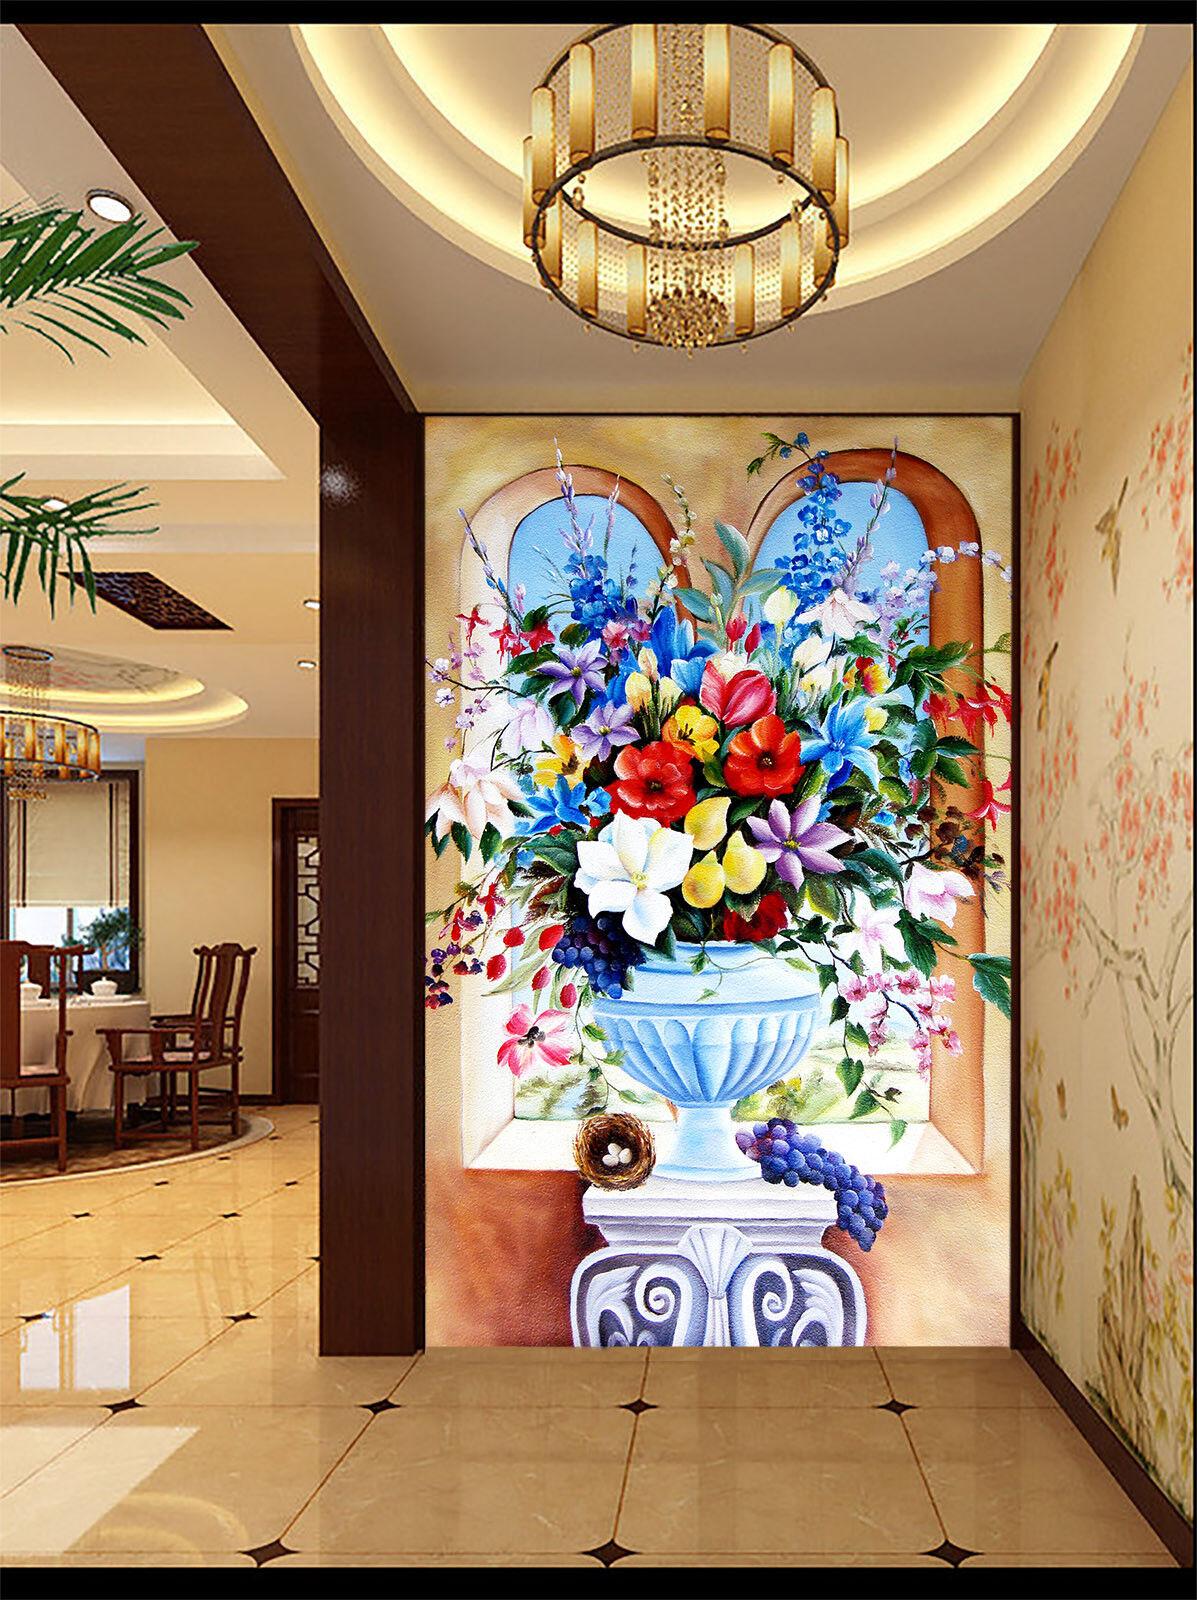 3D Zarte Blüten Blüten Blüten Kunst Töpfe 77 Tapete Wandgemälde Tapete Tapeten Bild Familie DE 5be91f